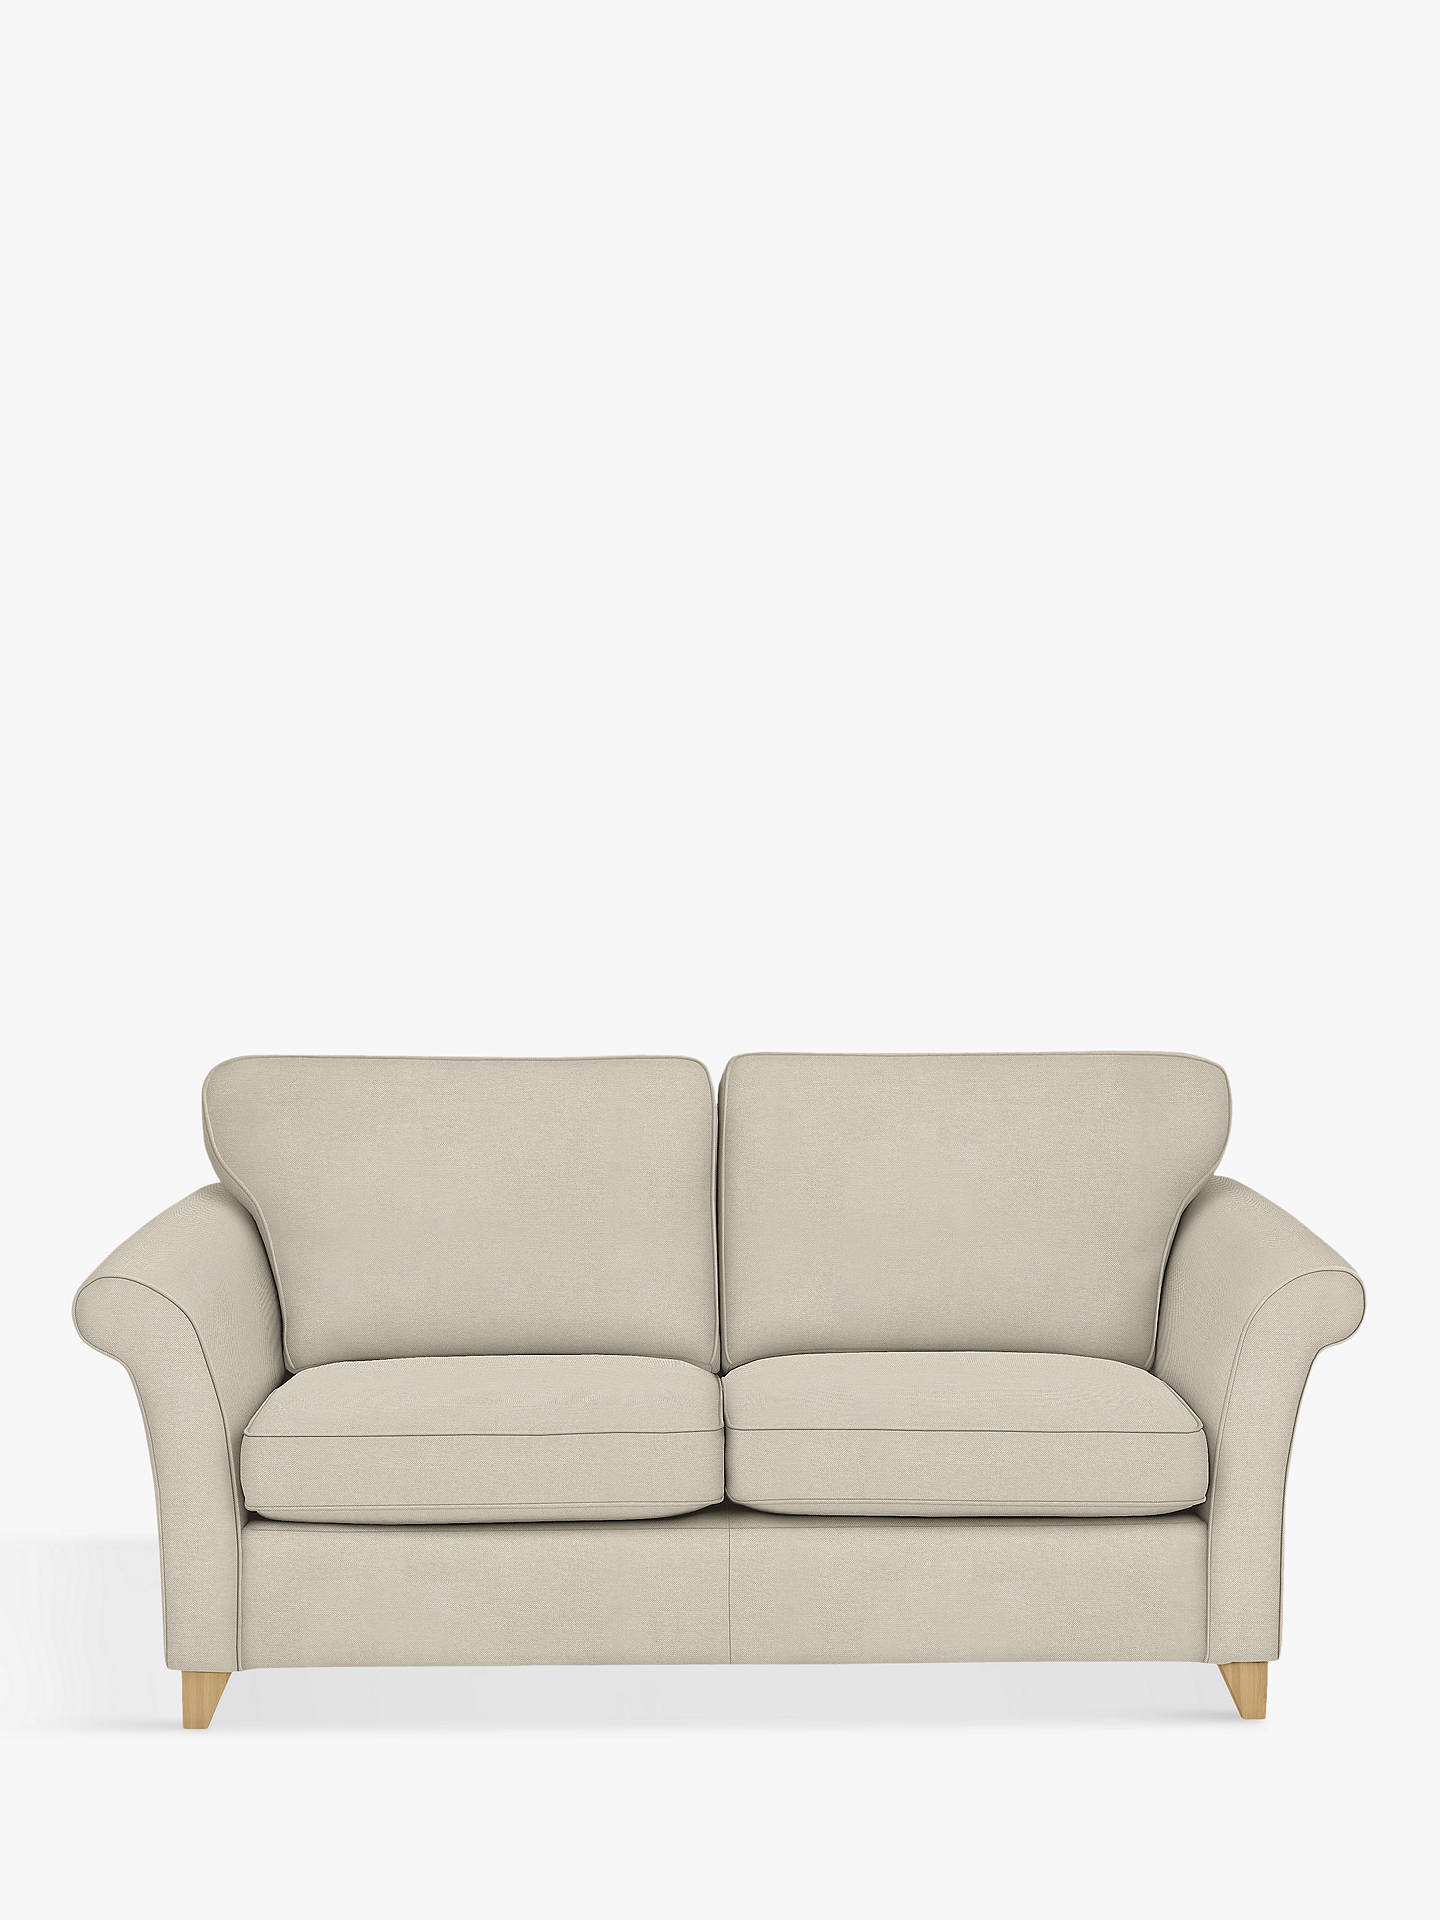 Surprising John Lewis Partners Charlotte Grand 3 Seater Sofa Bed Light Leg Edie Grey Download Free Architecture Designs Ogrambritishbridgeorg